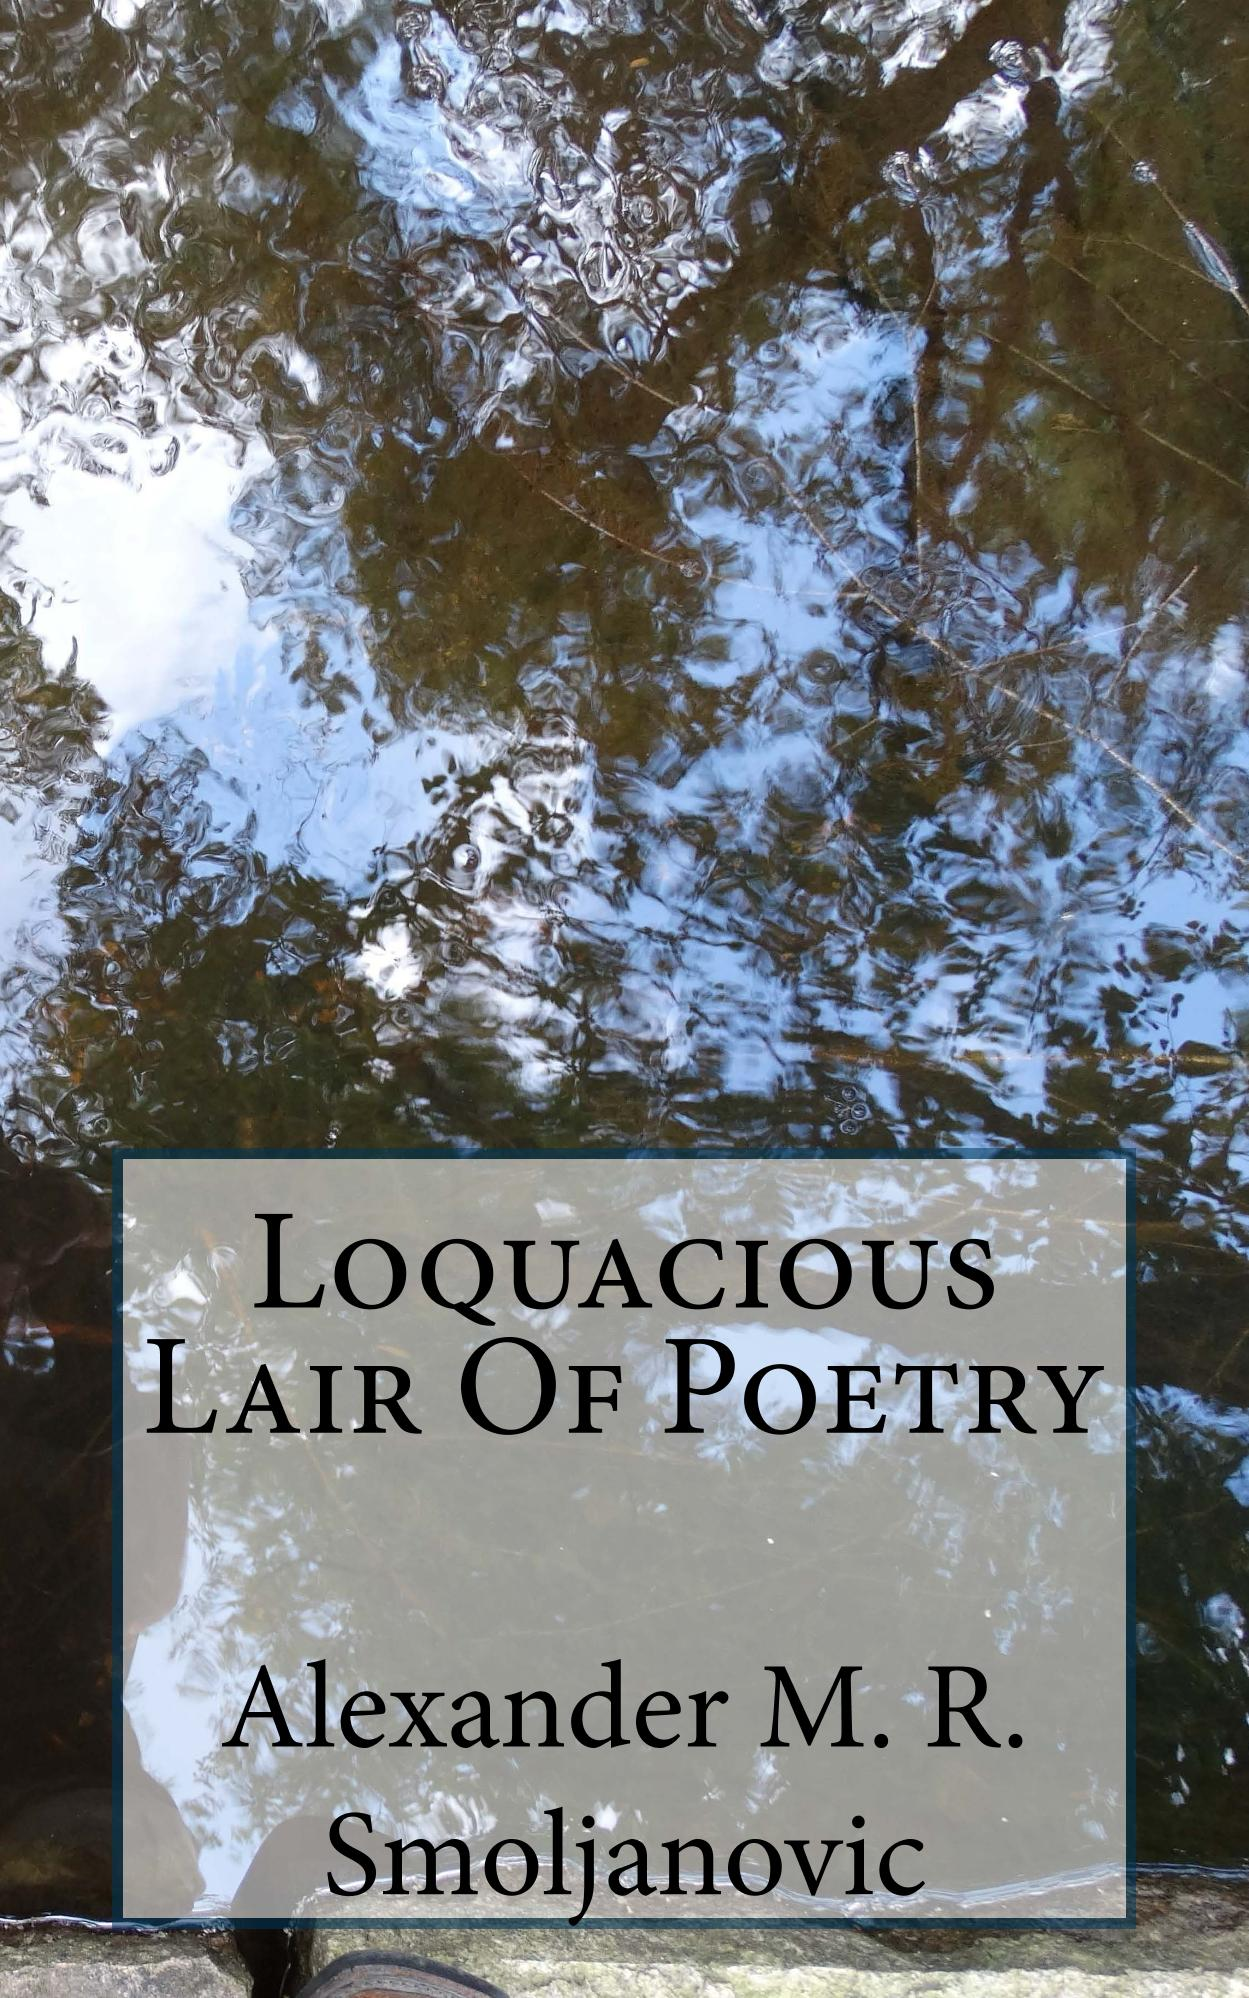 Loquacious Lair Of Poetry book on Amazon